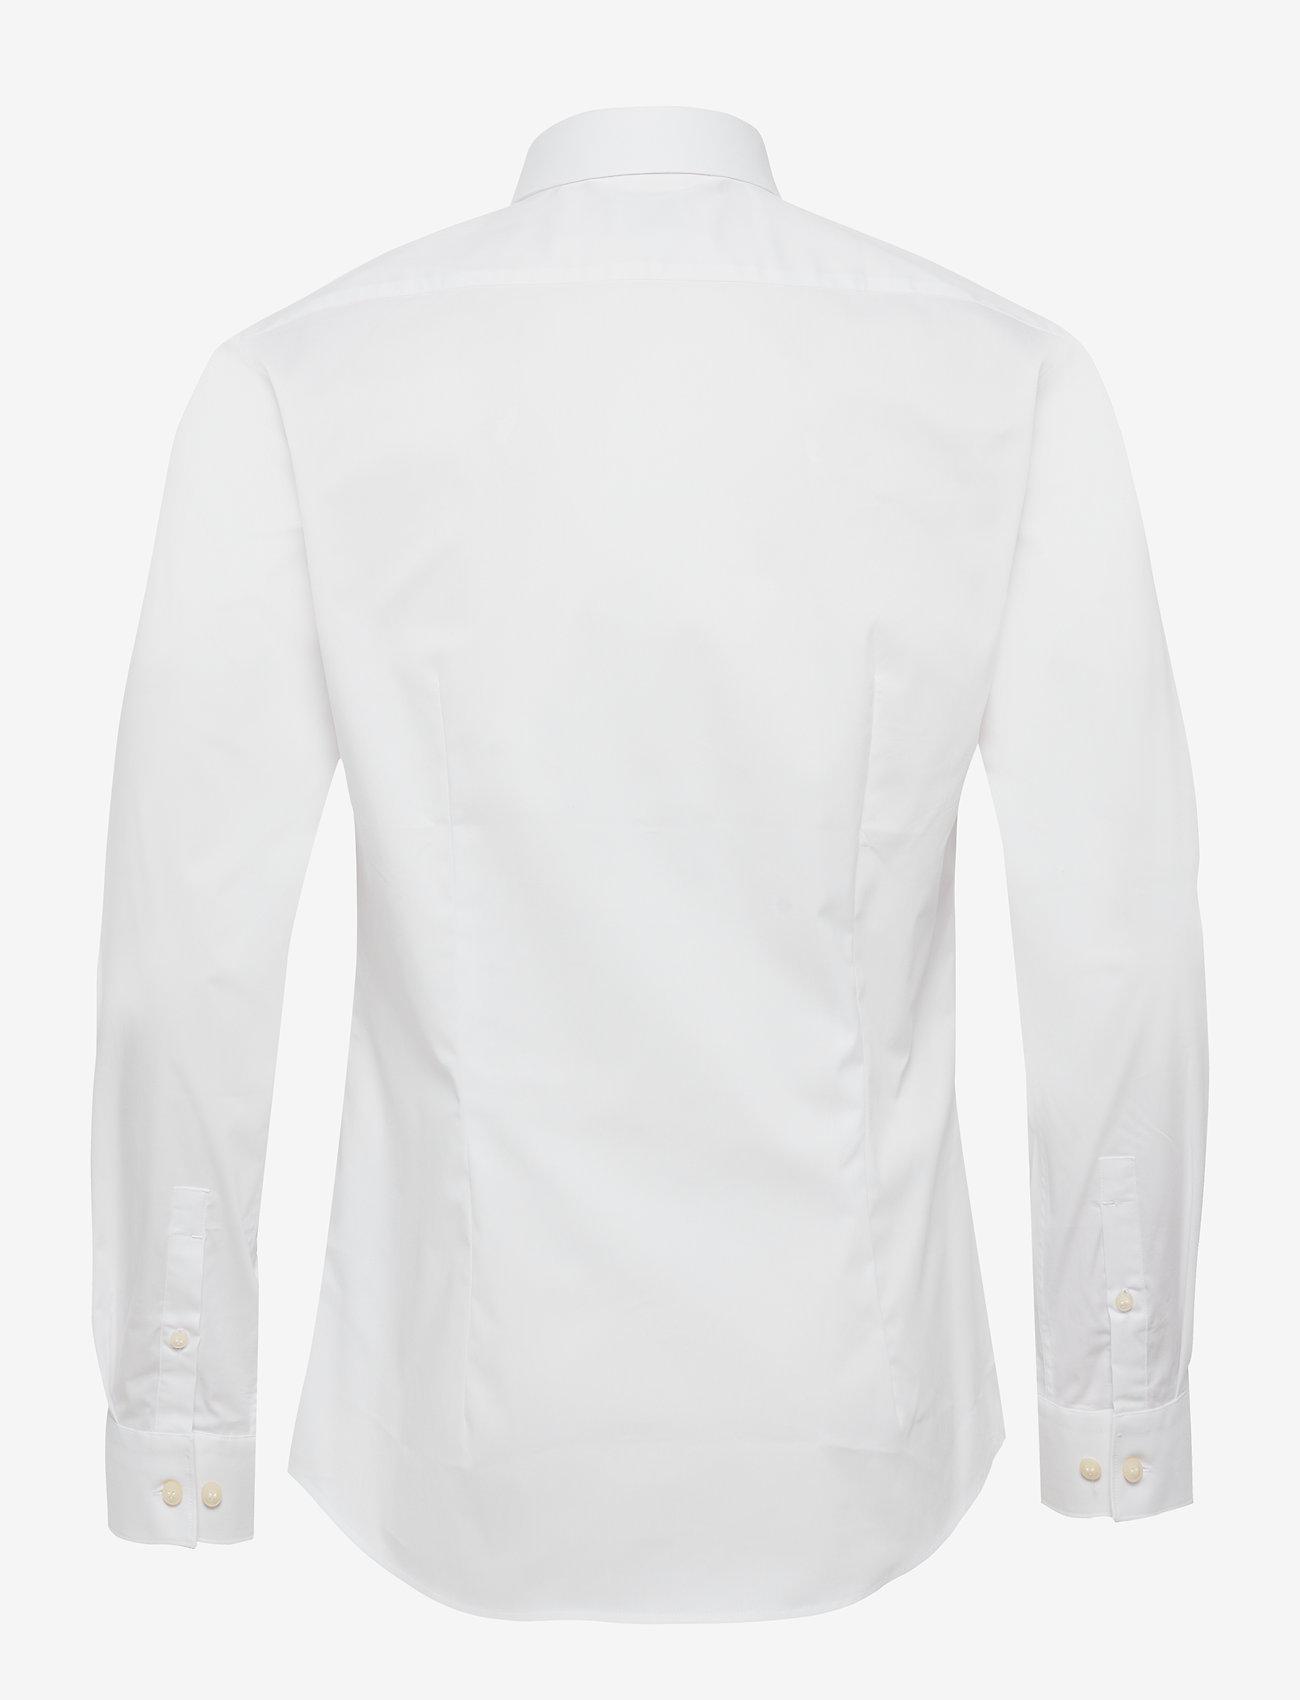 Tiger of Sweden - FILBRODIE - basic skjorter - pure white - 1